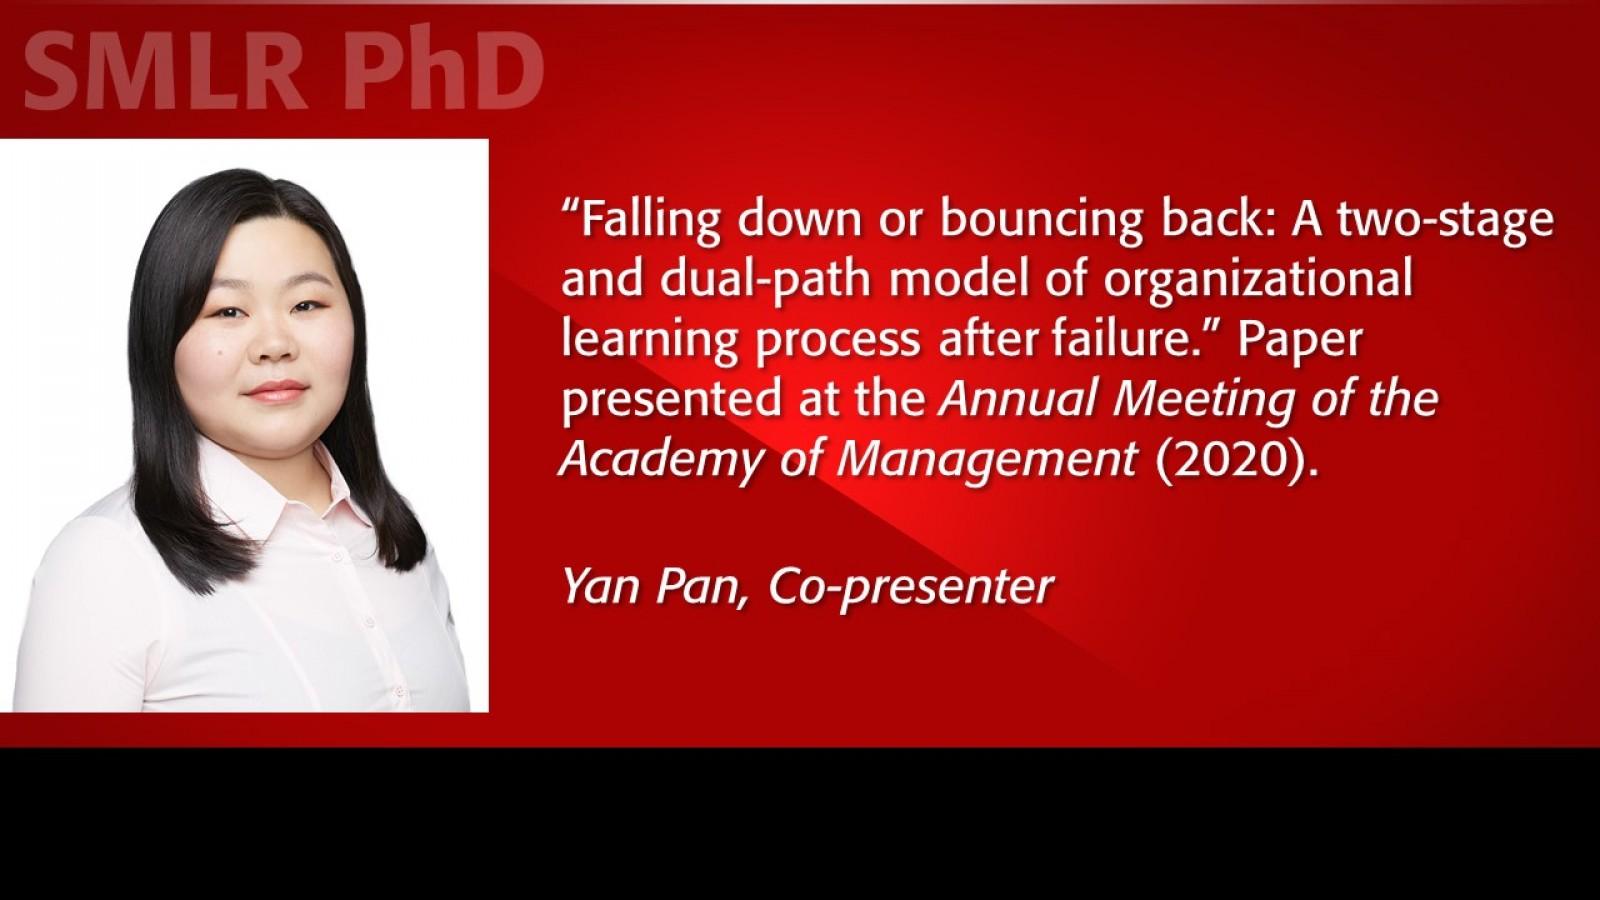 Image of Yan Pan